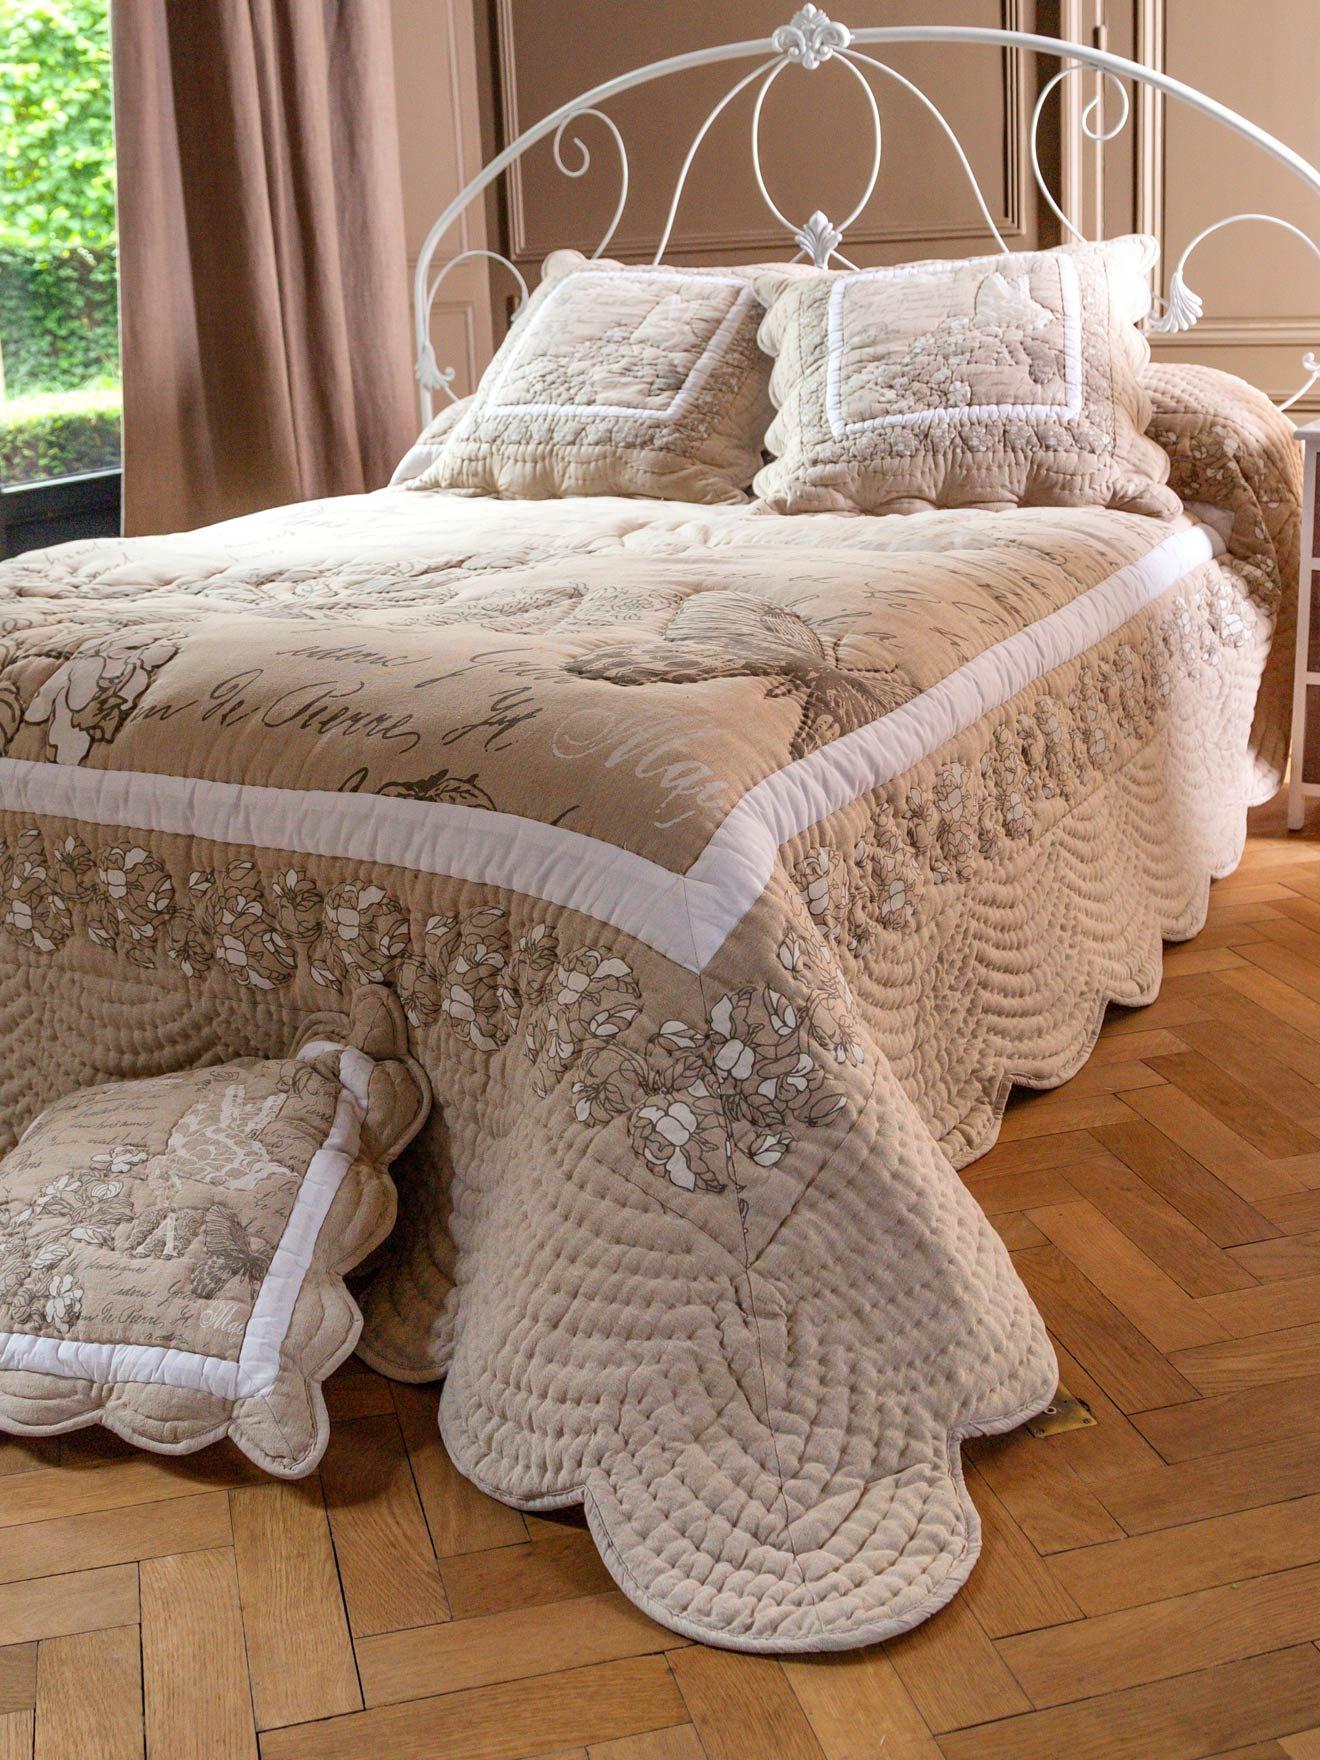 jet de lit boutis h lo se 150x150cm daxon. Black Bedroom Furniture Sets. Home Design Ideas